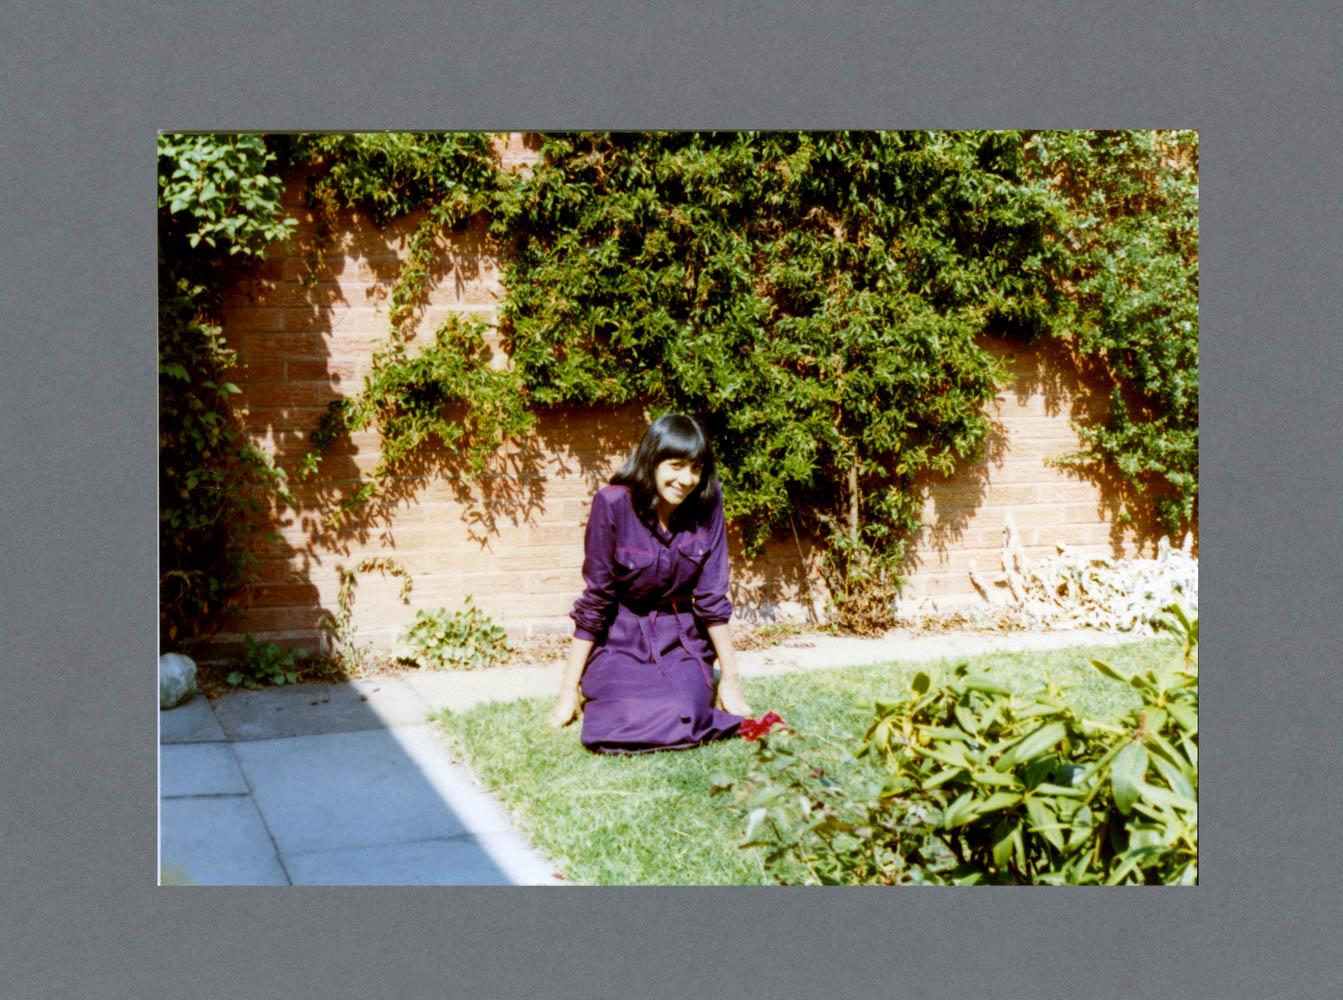 Woodcote Rd. c.1987